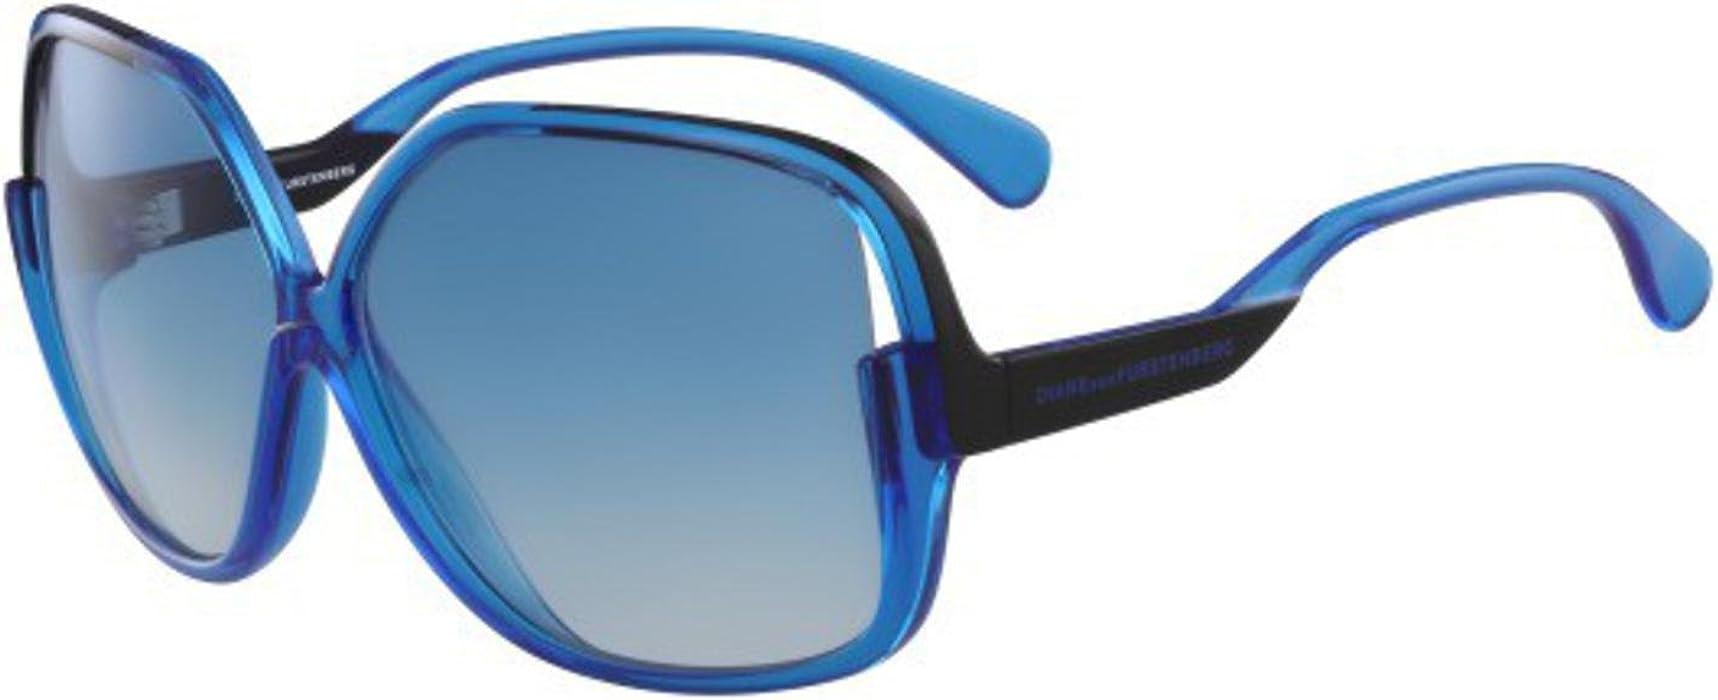 Amazon.com: Sunglasses Diane von Furstenberg DVF 510 S JAYDA ...